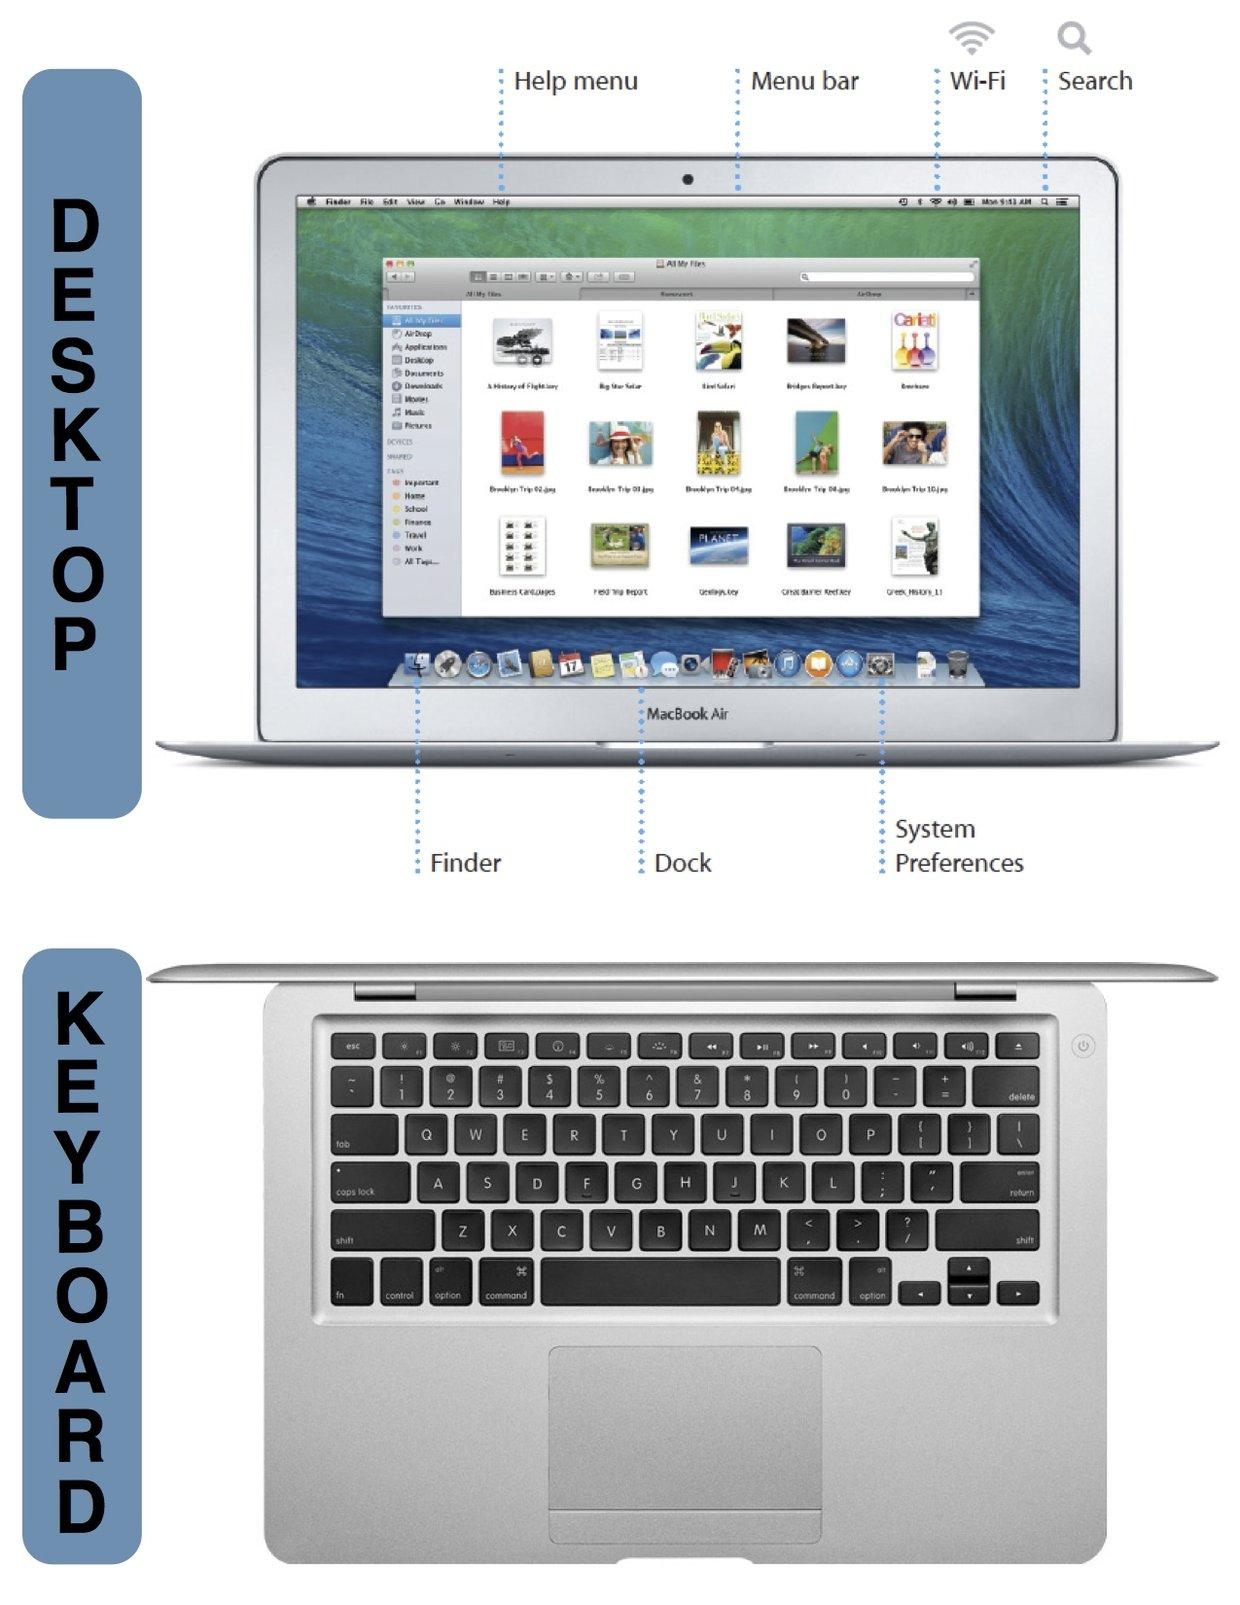 MacBook Air Basics